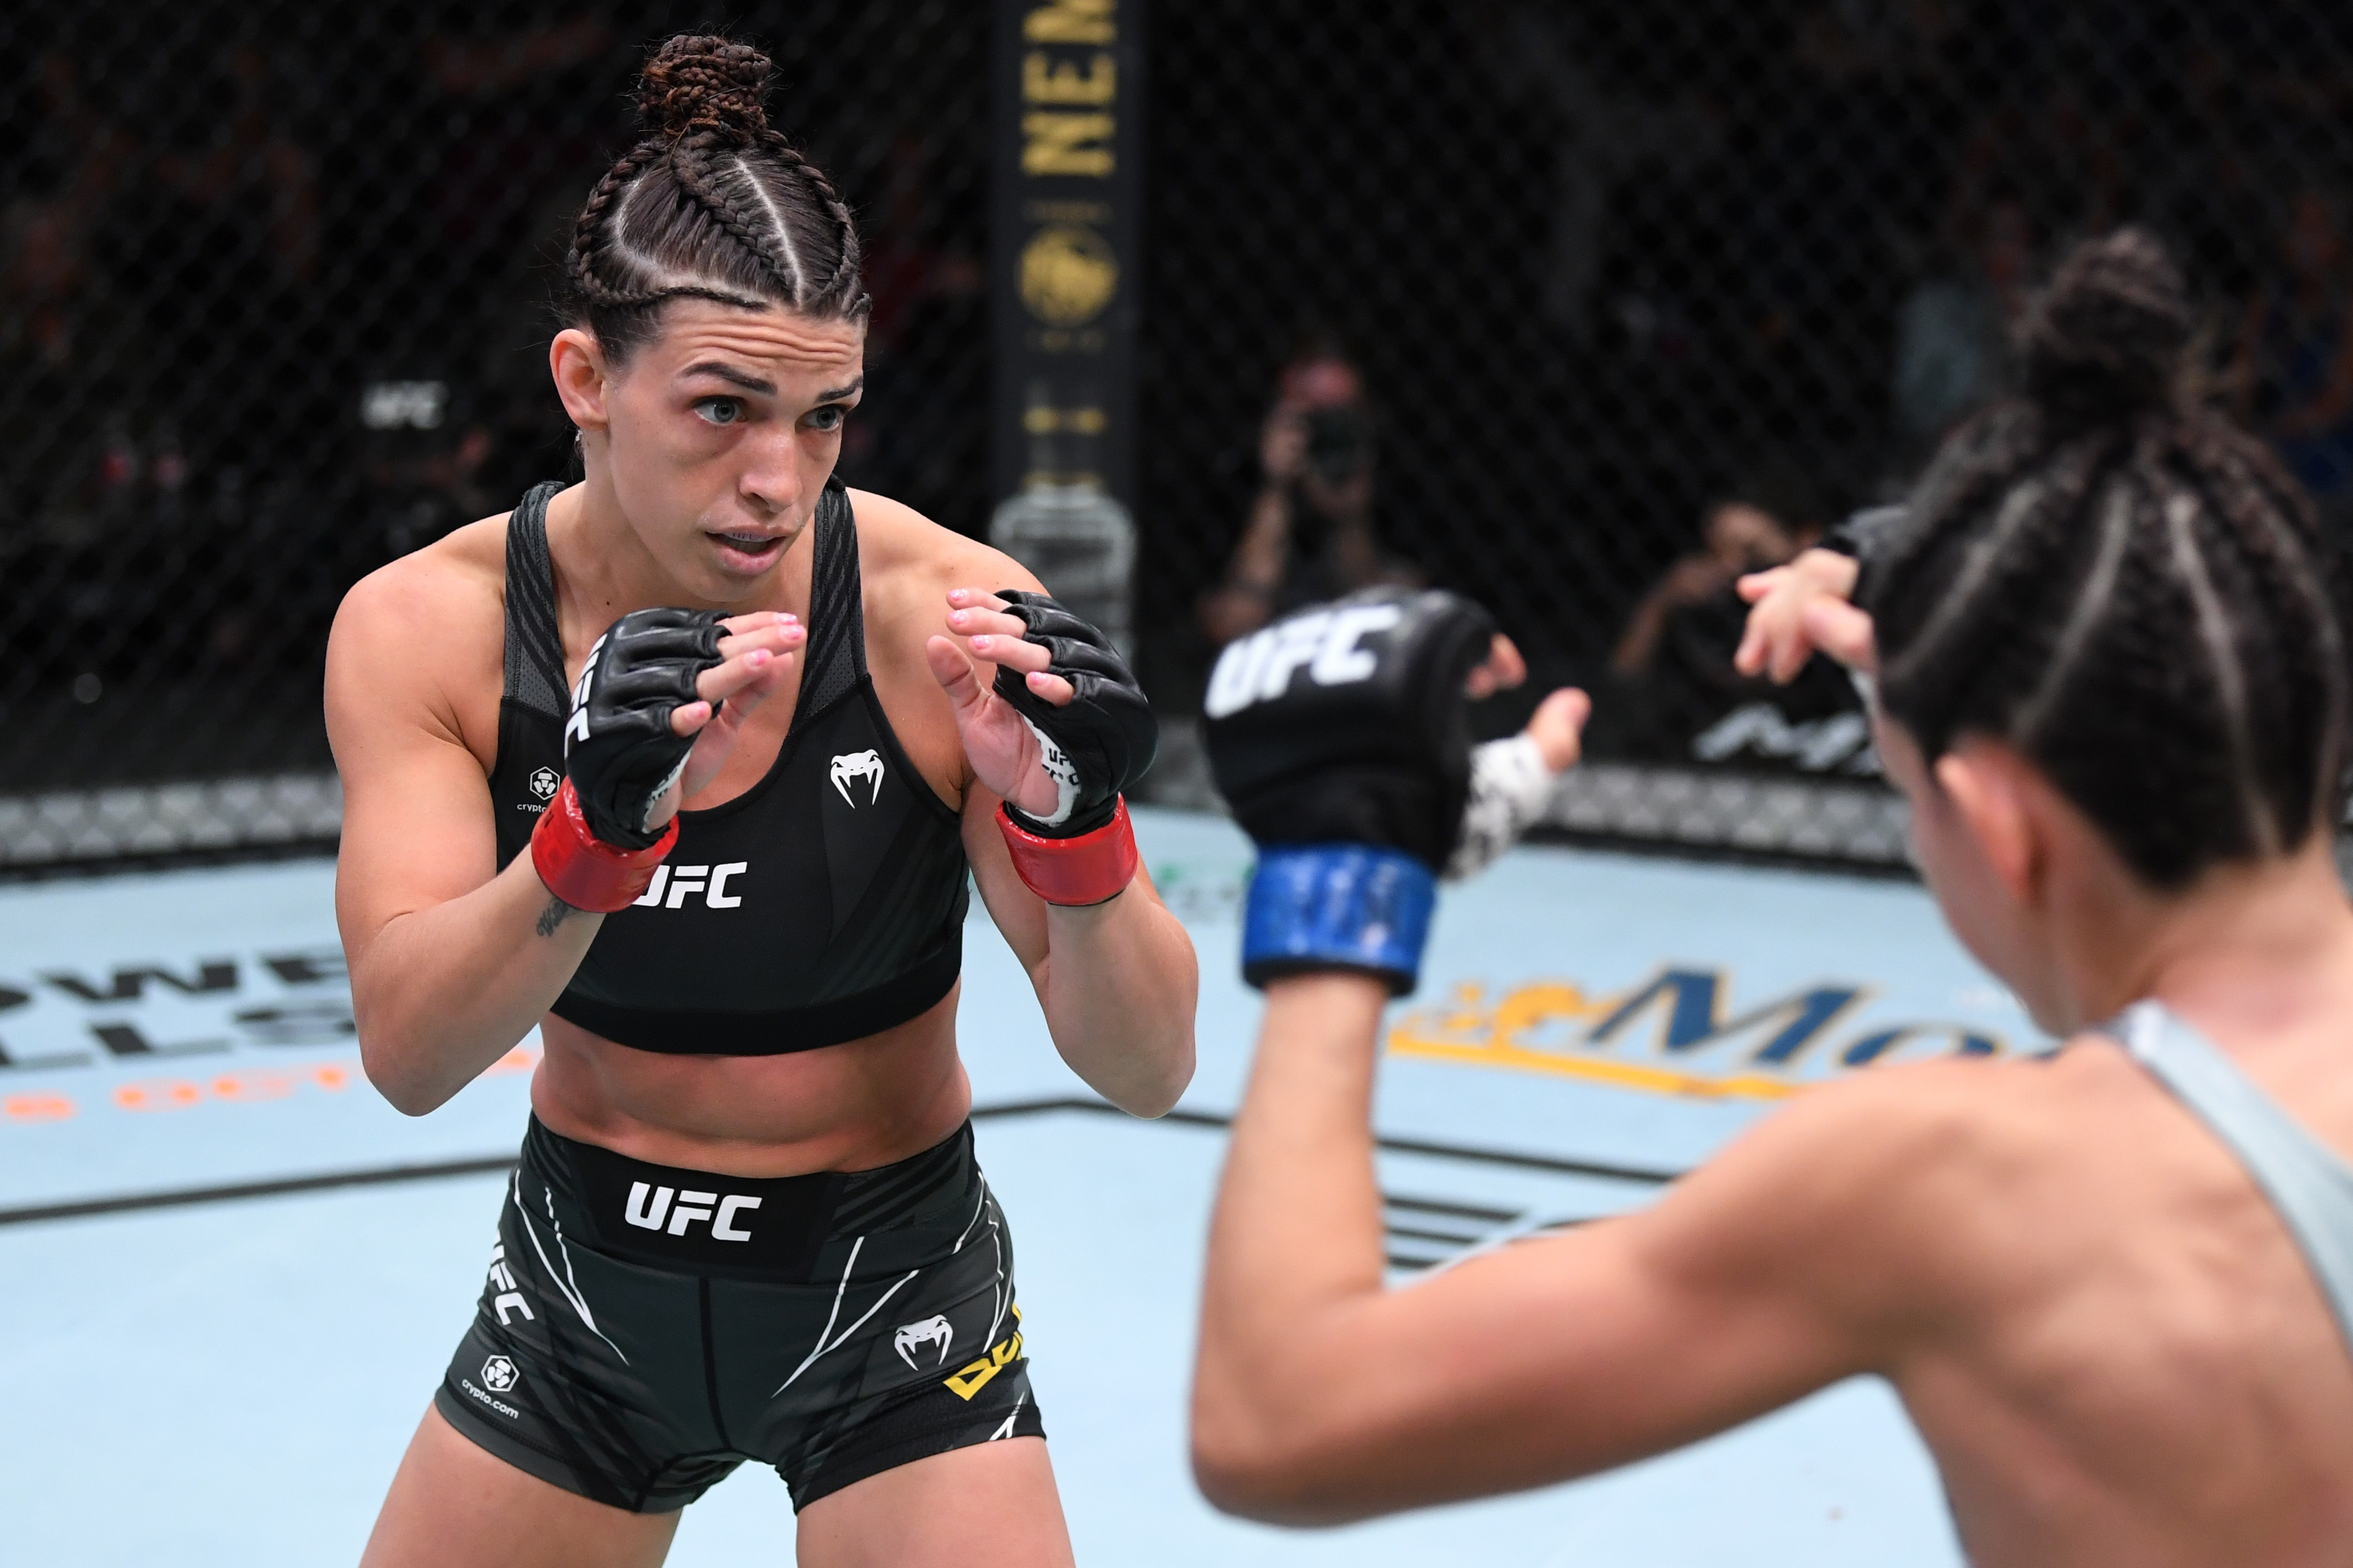 Mackenzie Dern during her fight with Marina Rodriguez at UFC Vegas 39.